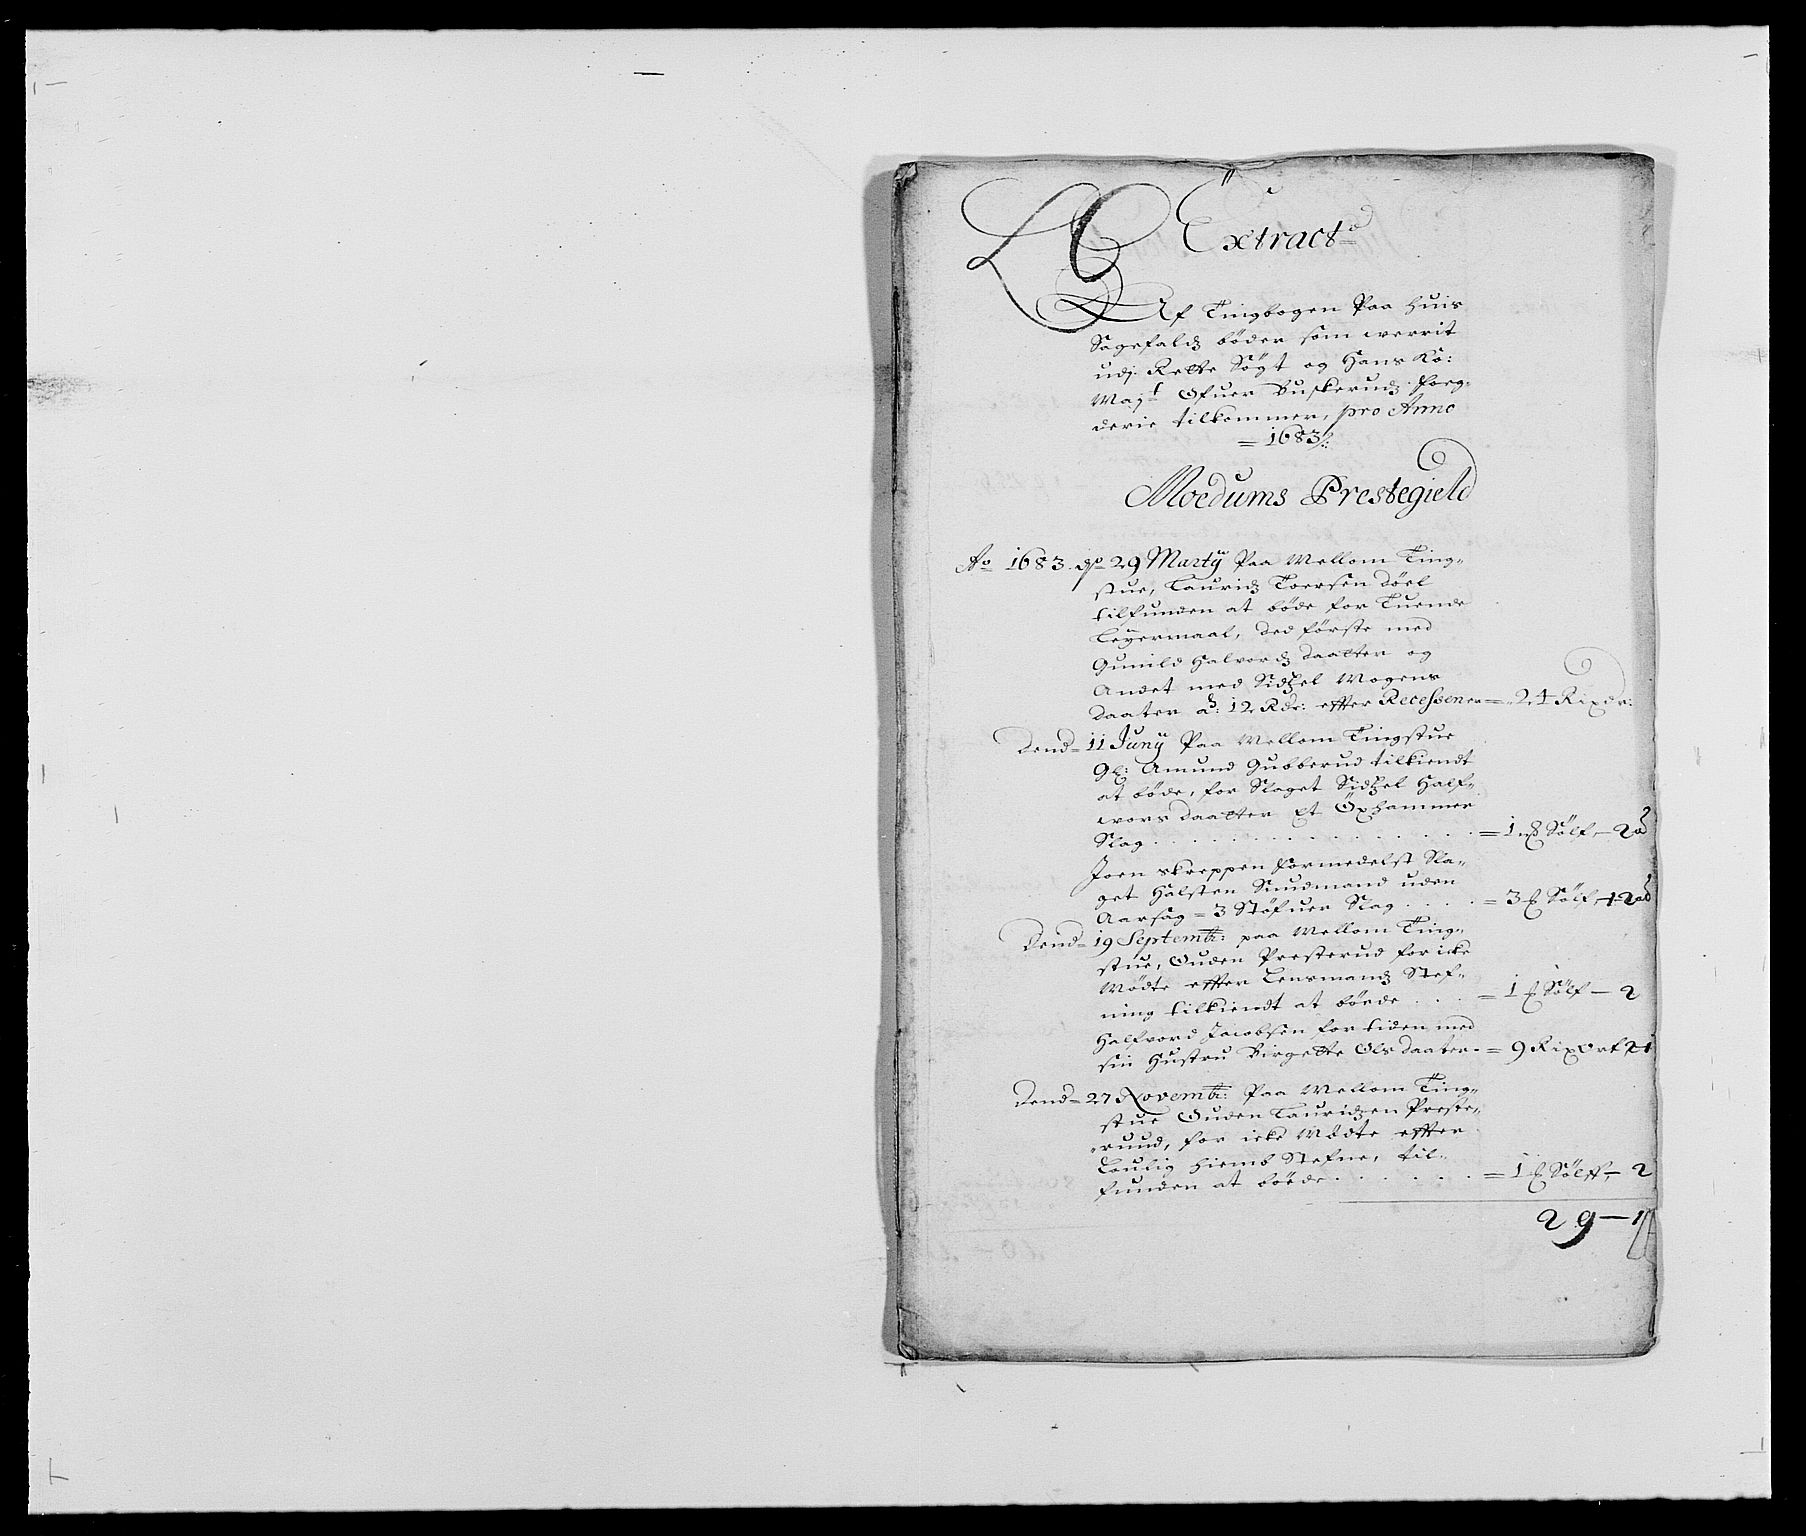 RA, Rentekammeret inntil 1814, Reviderte regnskaper, Fogderegnskap, R25/L1677: Fogderegnskap Buskerud, 1683-1684, s. 26